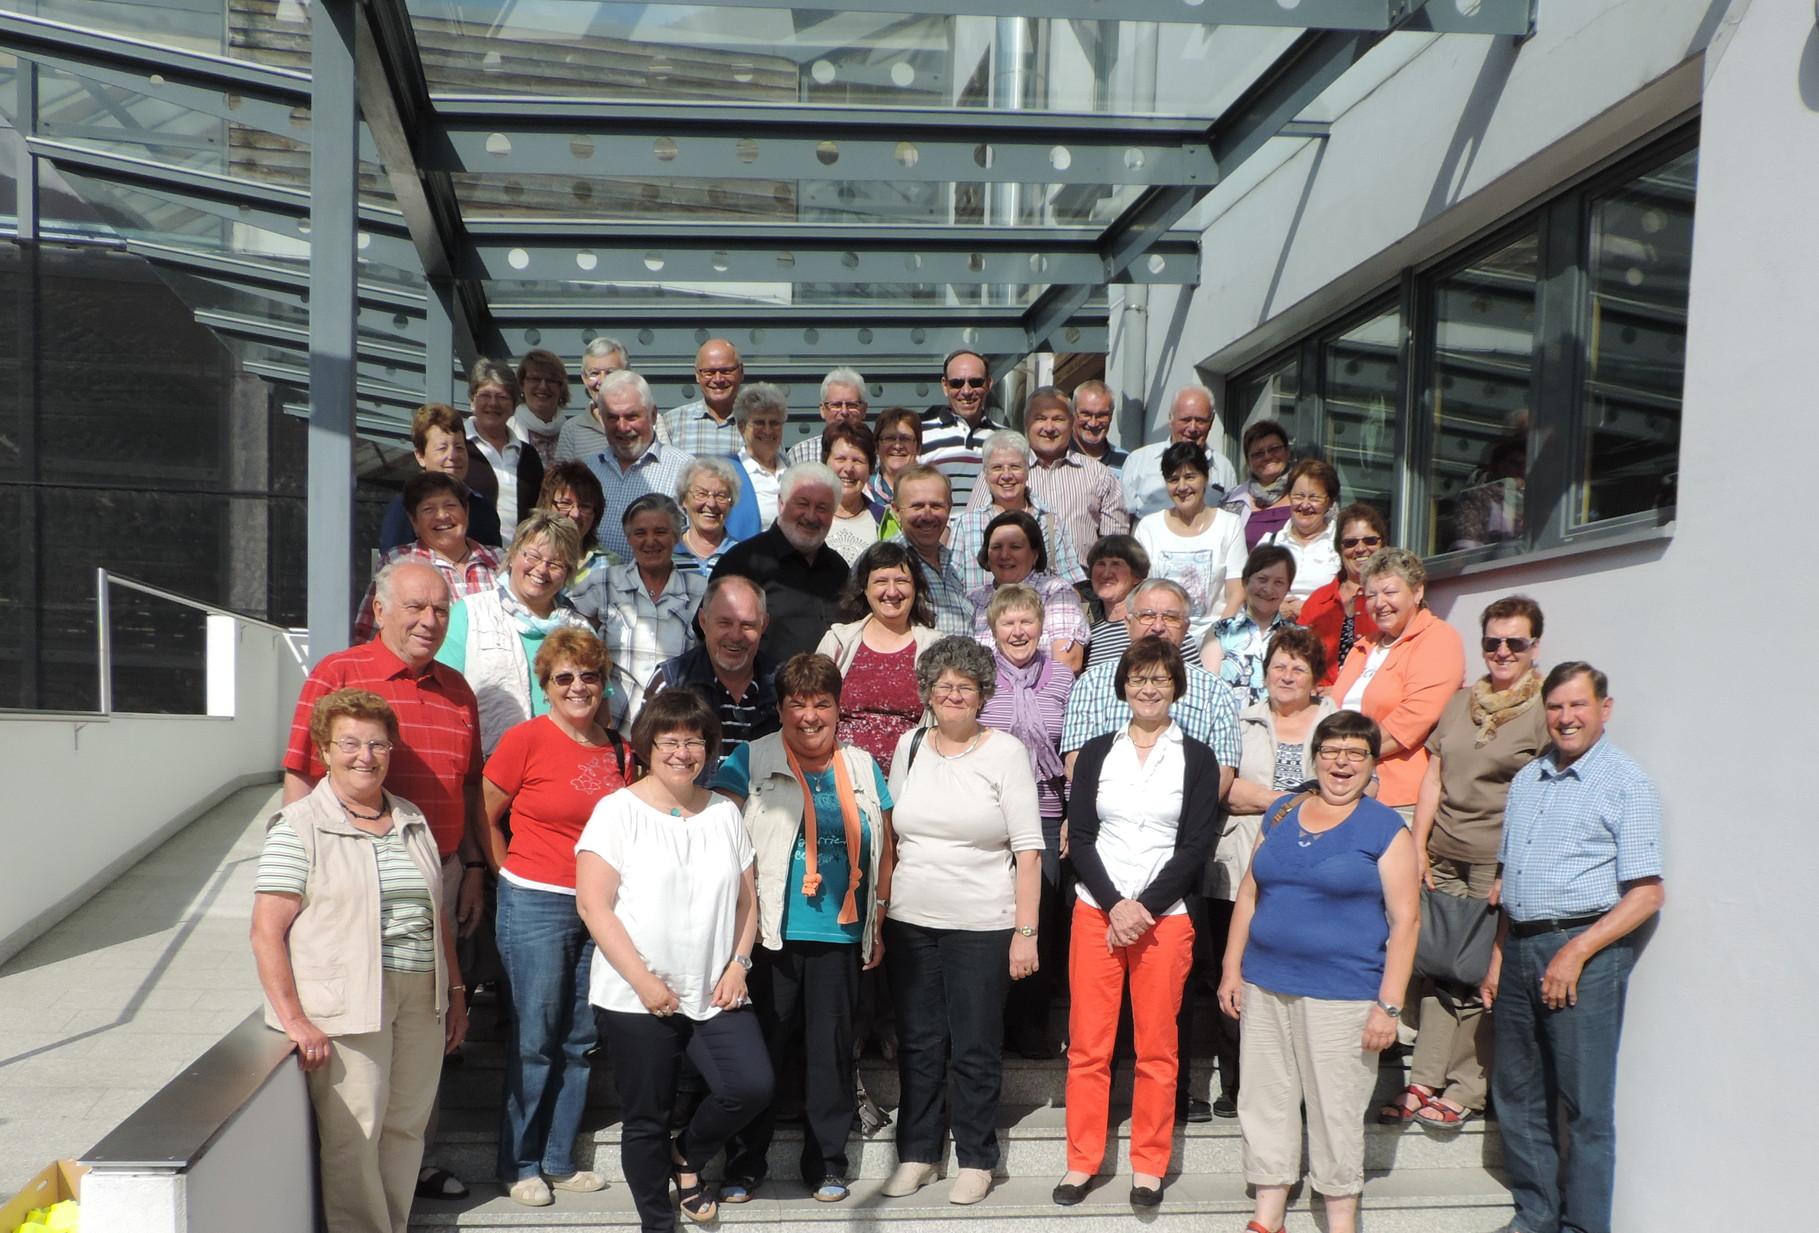 Gruppenbild vor der Obstgenossenschaft Melix in Brixen